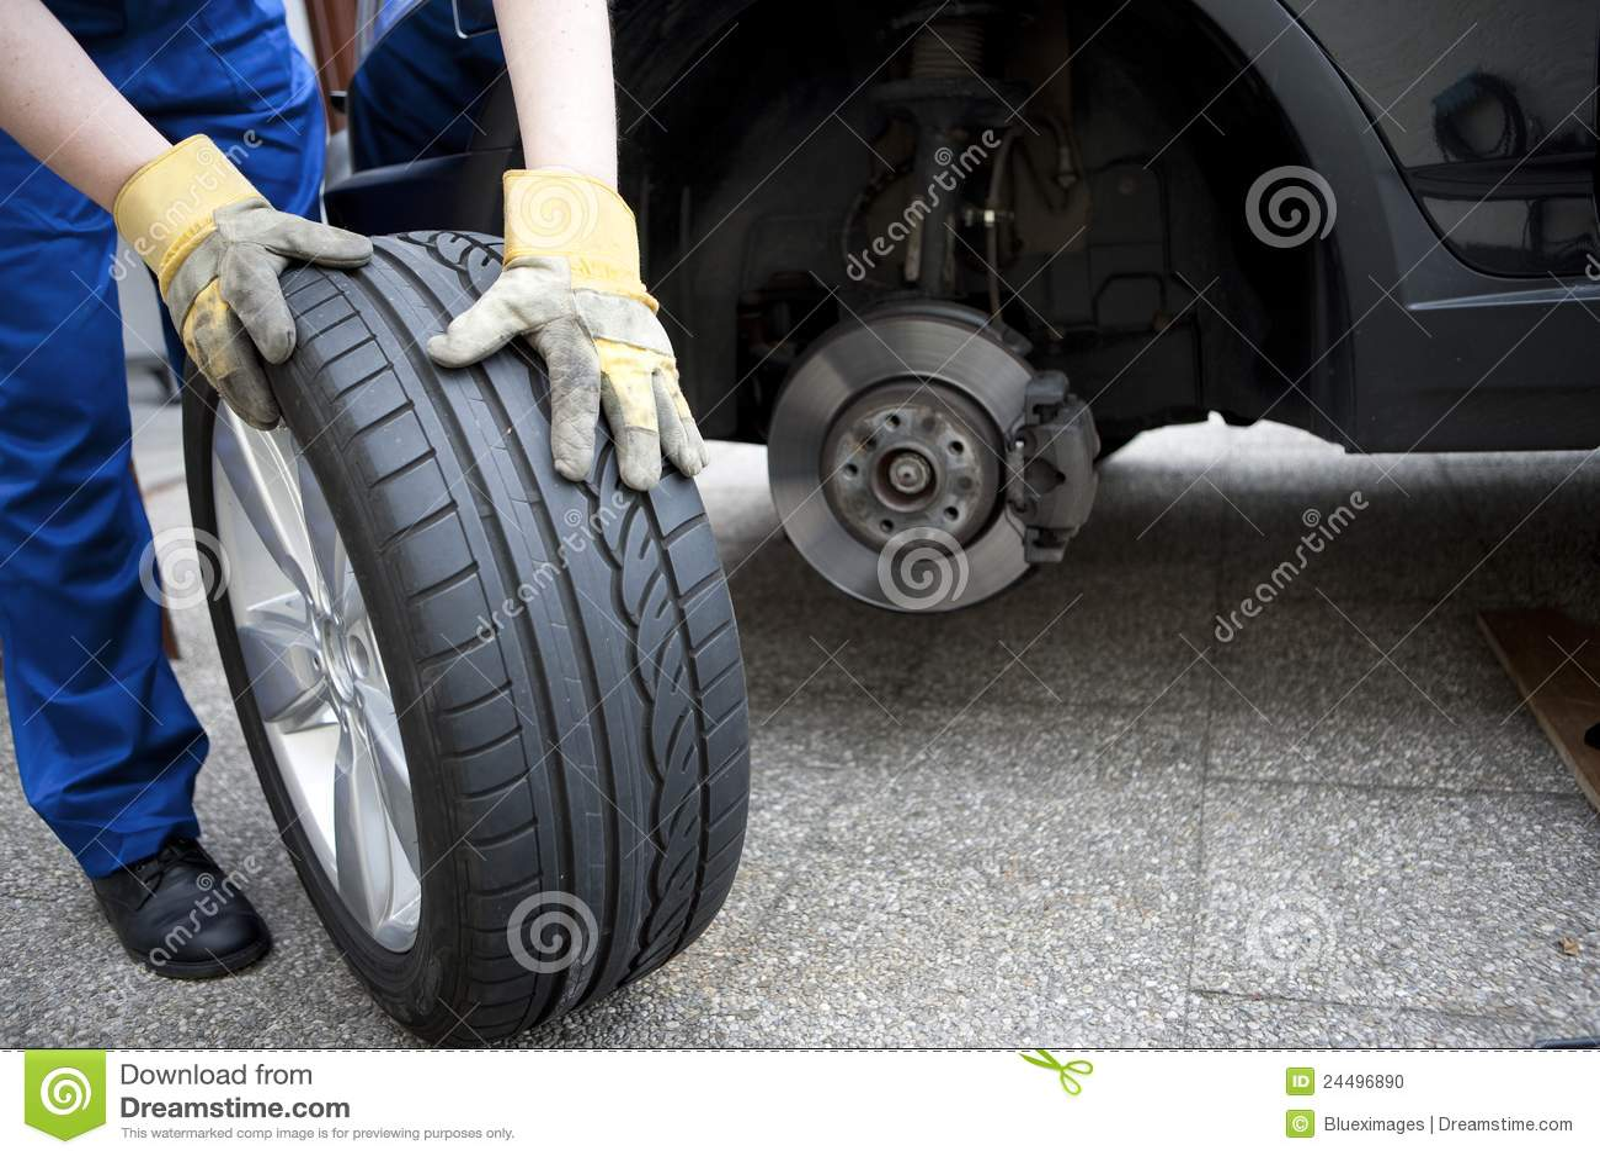 Change Of Tyres Stock Photo Image Of Garage Snow